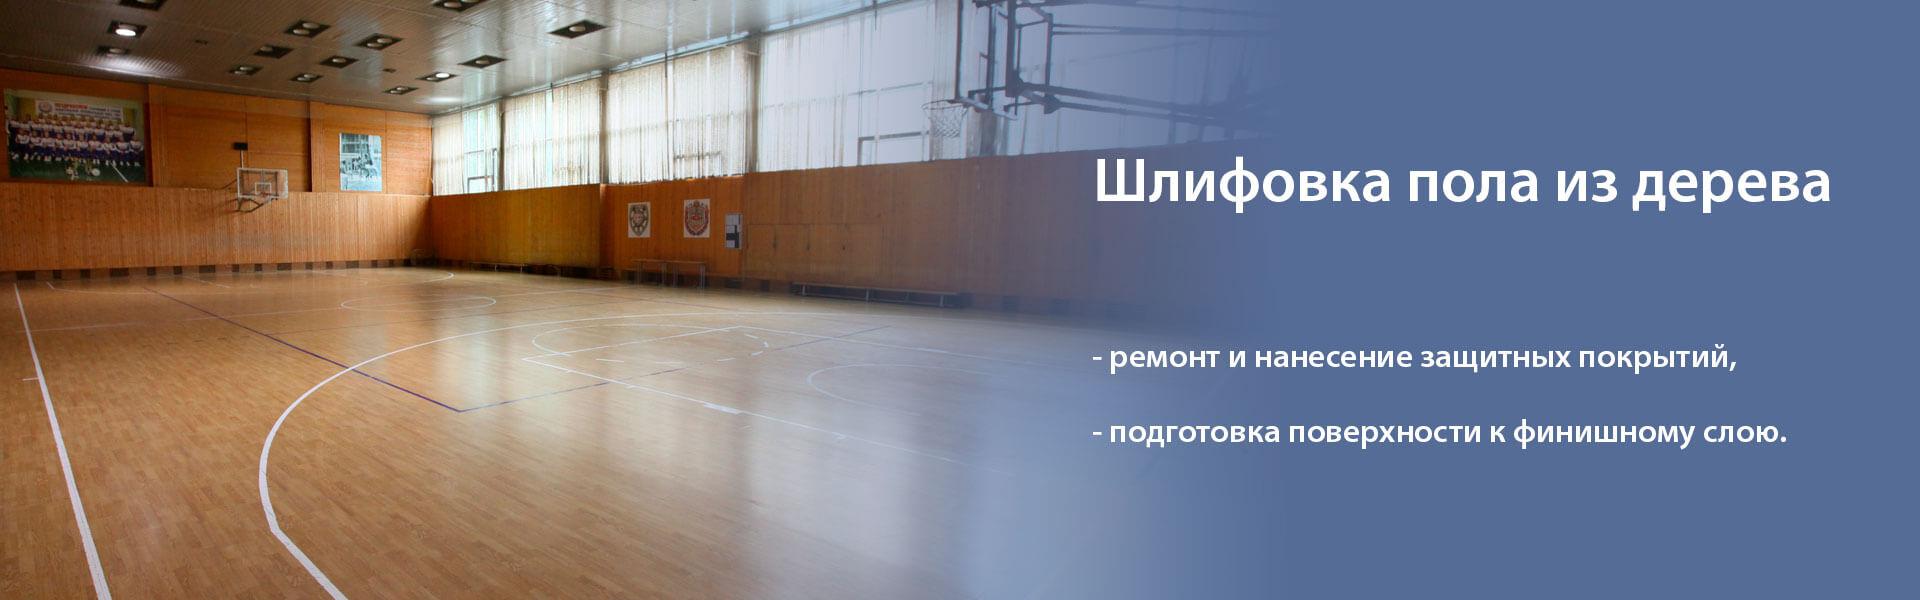 Шлифовка деревянного пола и паркета в Минске и Беларуси под ключ недорого